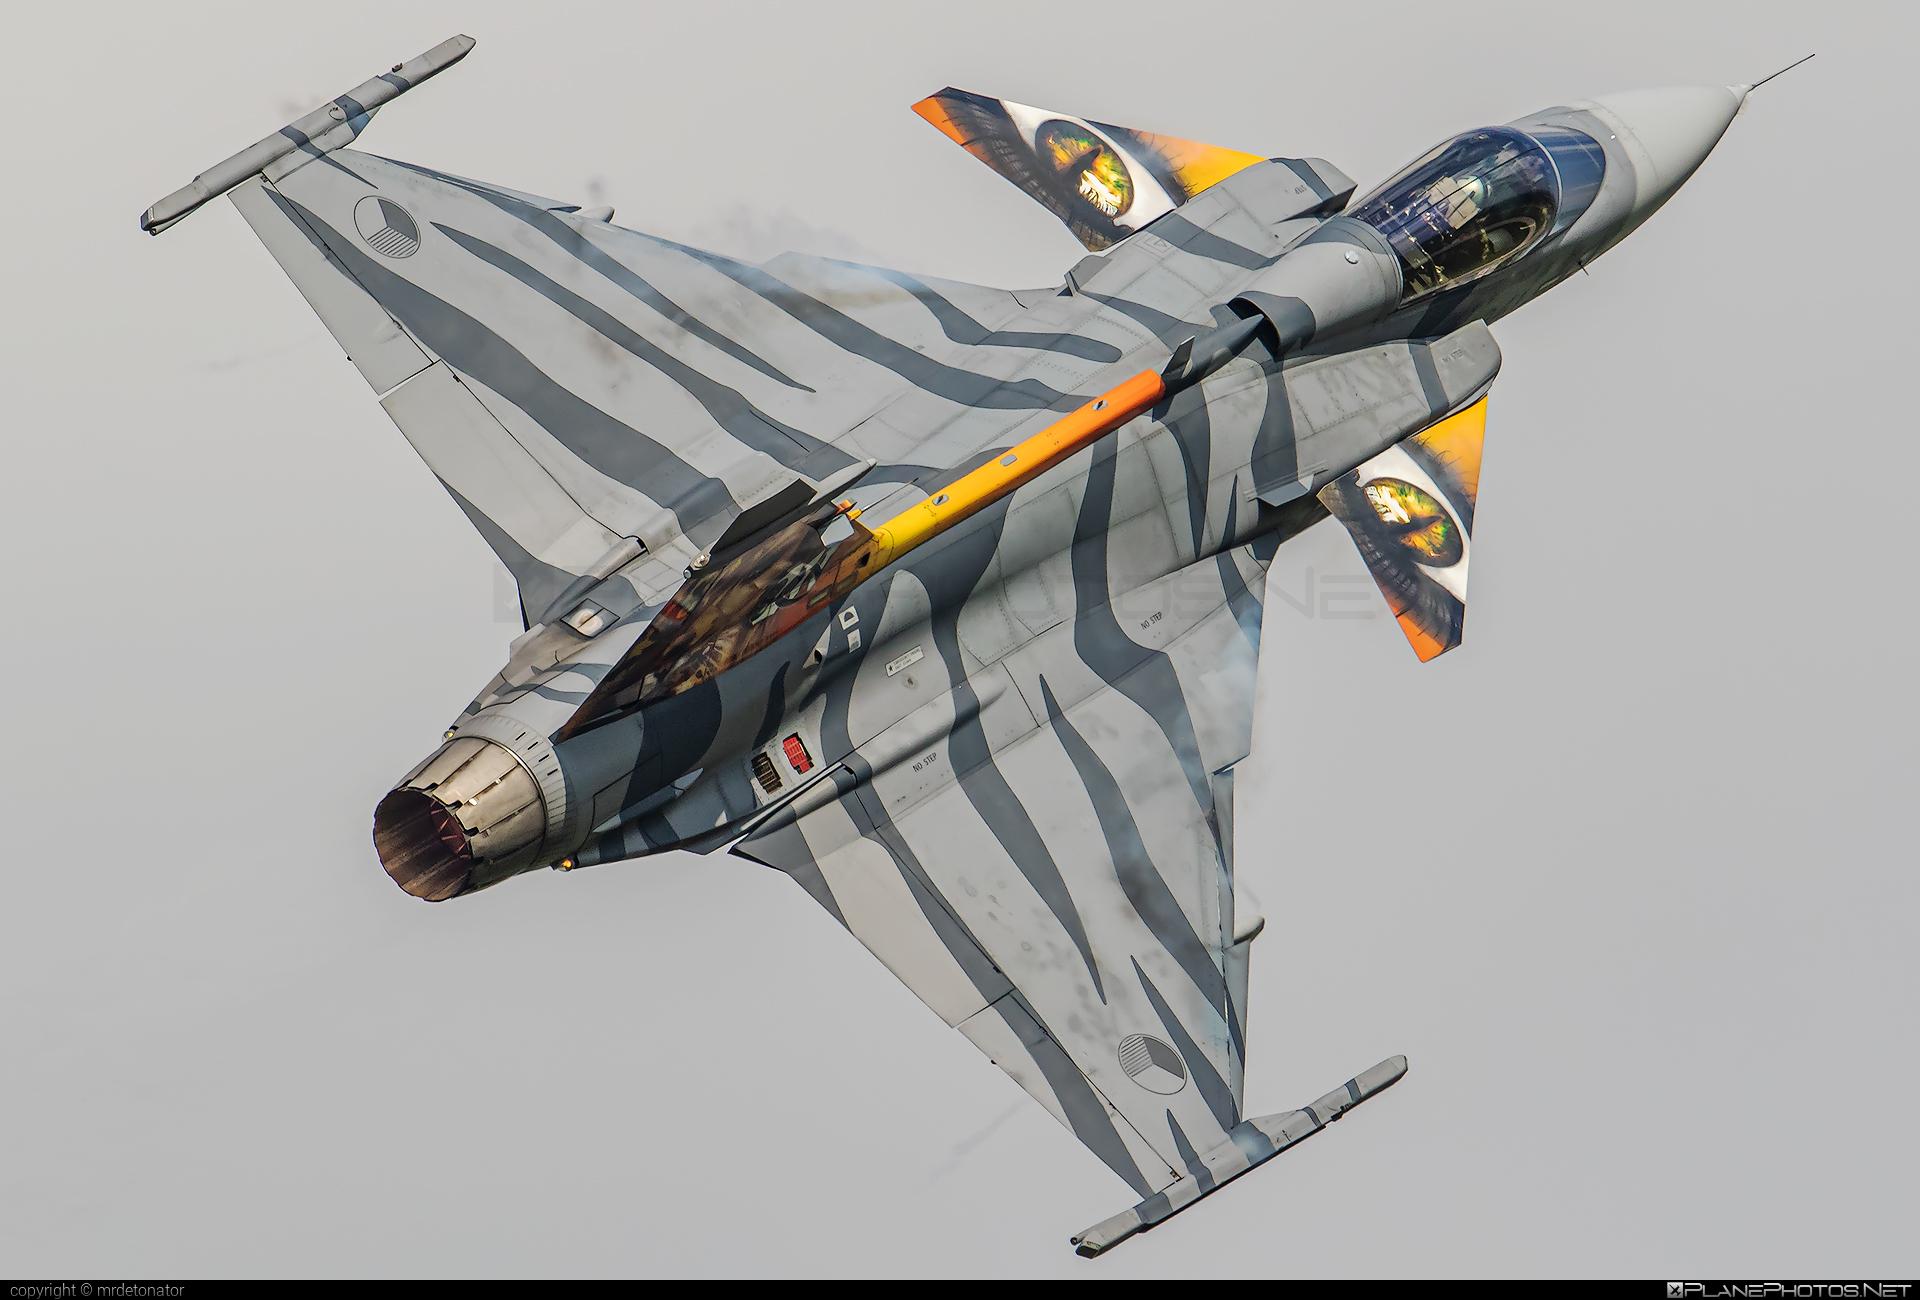 Saab JAS 39C Gripen - 9241 operated by Vzdušné síly AČR (Czech Air Force) #czechairforce #gripen #jas39 #jas39c #jas39gripen #natodays2018 #saab #vzdusnesilyacr